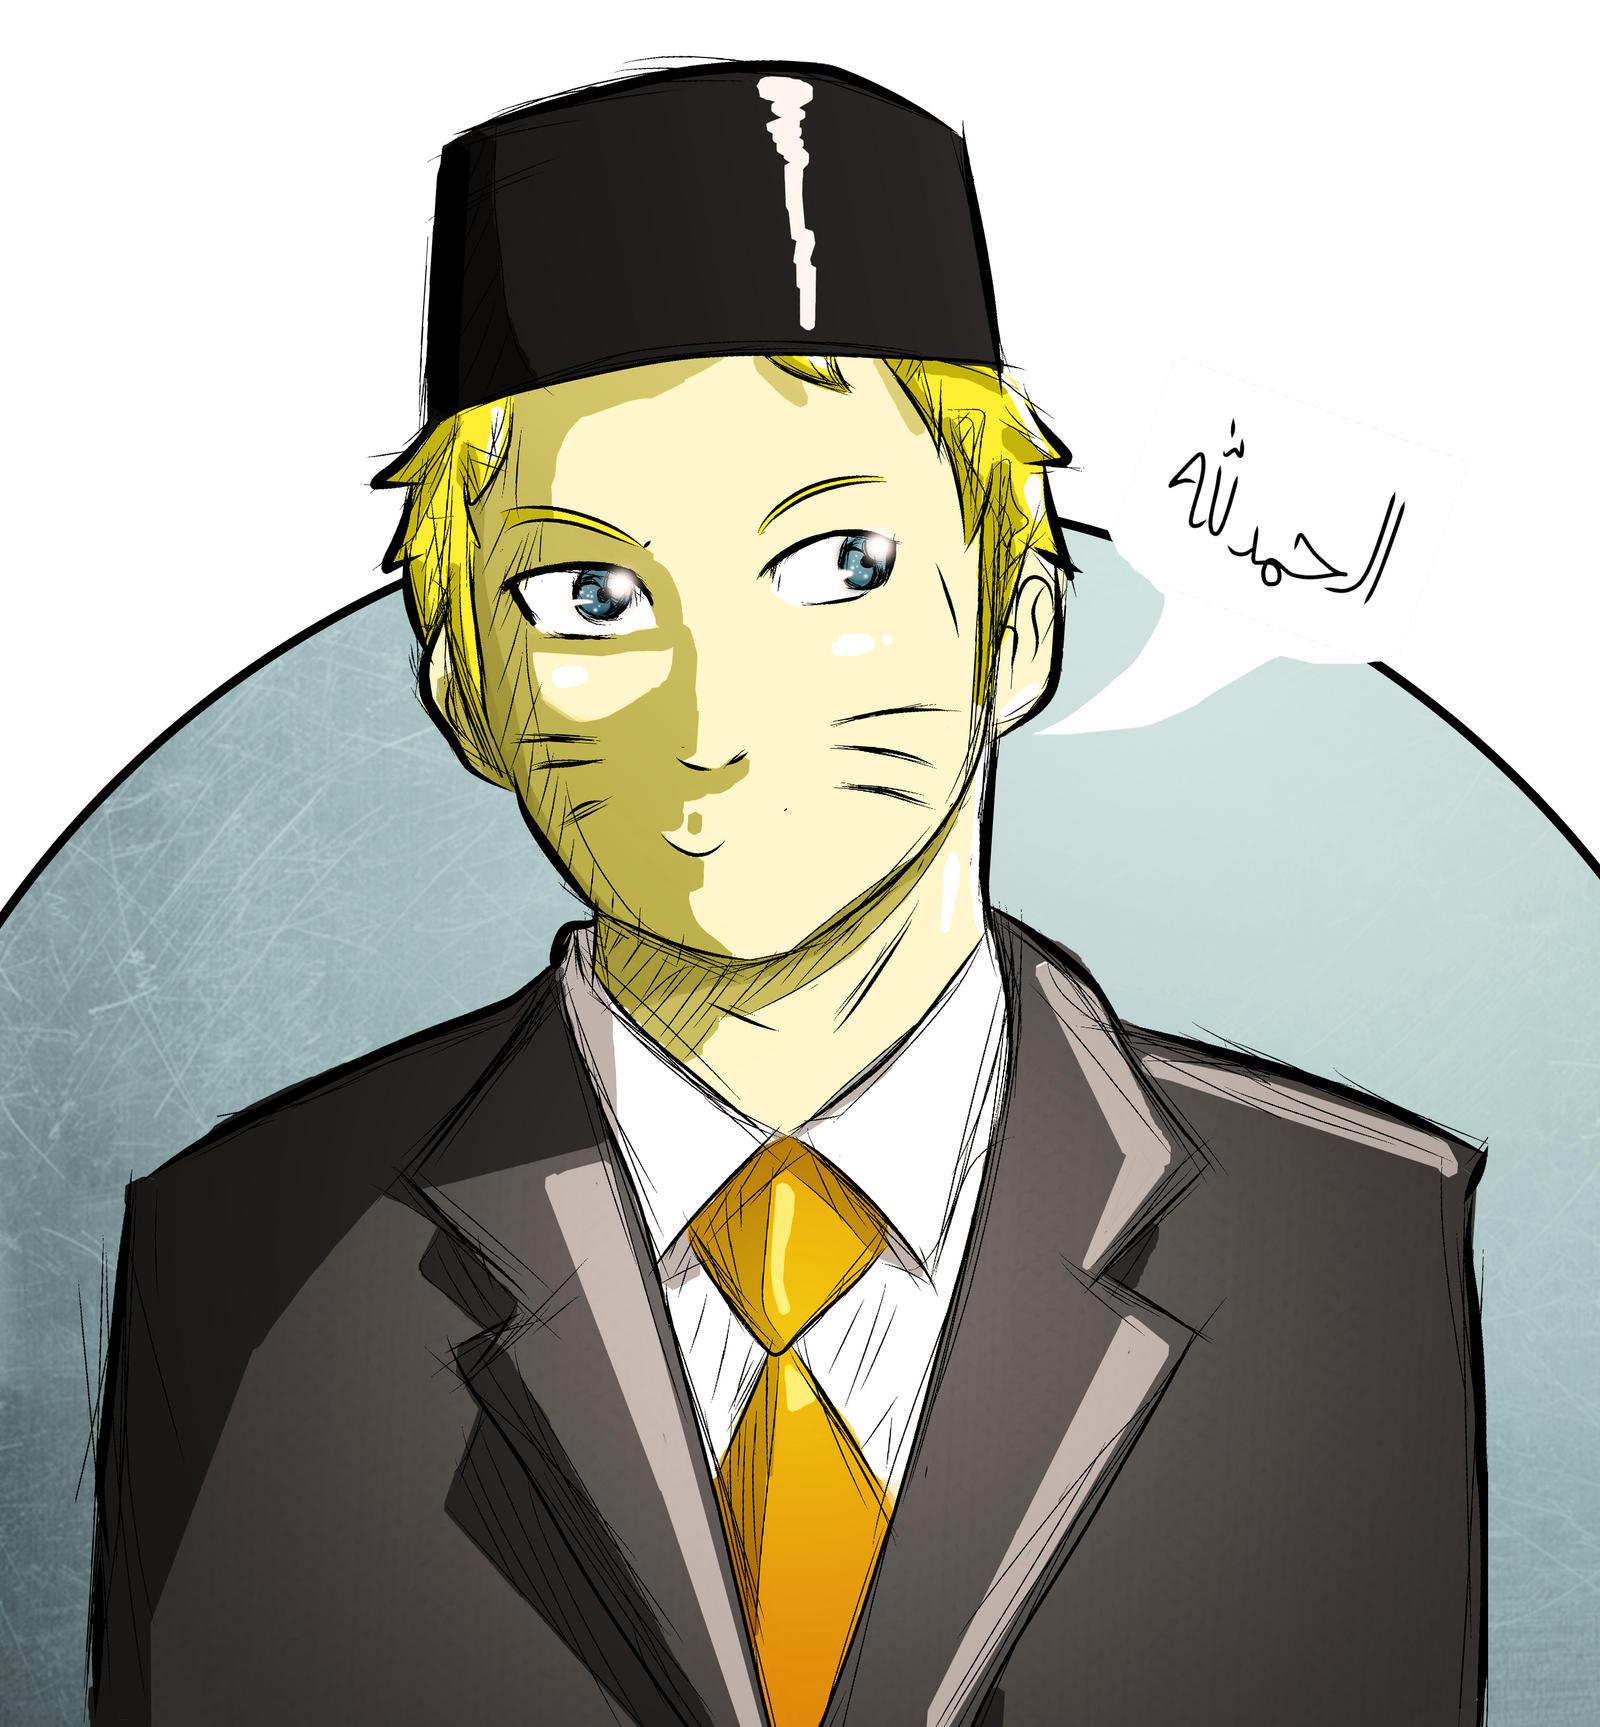 Anime Naruto Islami Imam Muda By Sirimran On Deviantart